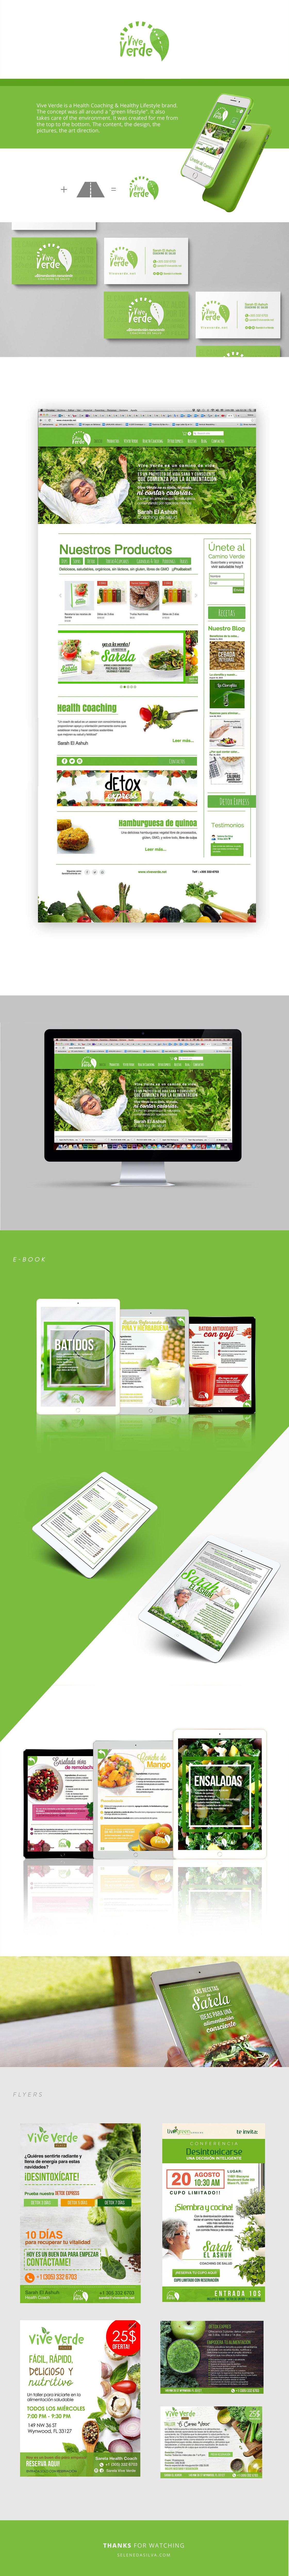 Vive Verde Branding